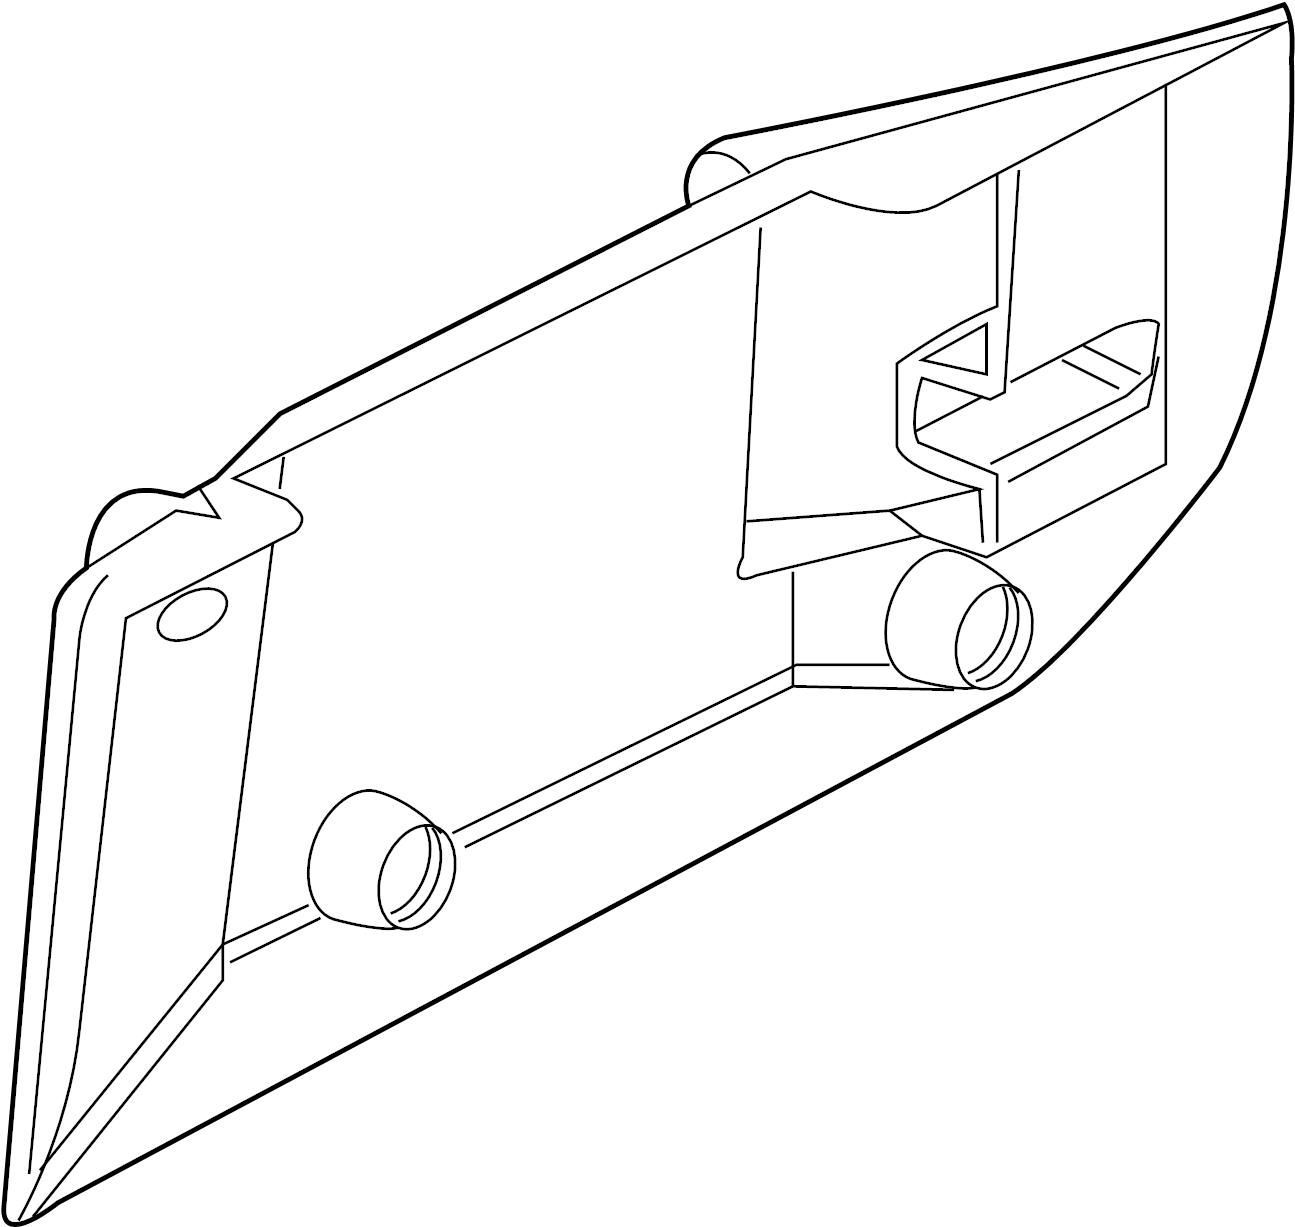 1968 Camaro Ignition Wiring Diagram further Western Star Ac Wiring Diagram together with Oldsmobile Aurora Wire Diagrams also 25820975 additionally 328ha 1955 F100 Anybody A 472 72 Caddy Eldorado Im Wiring. on 72 buick wiring diagrams online